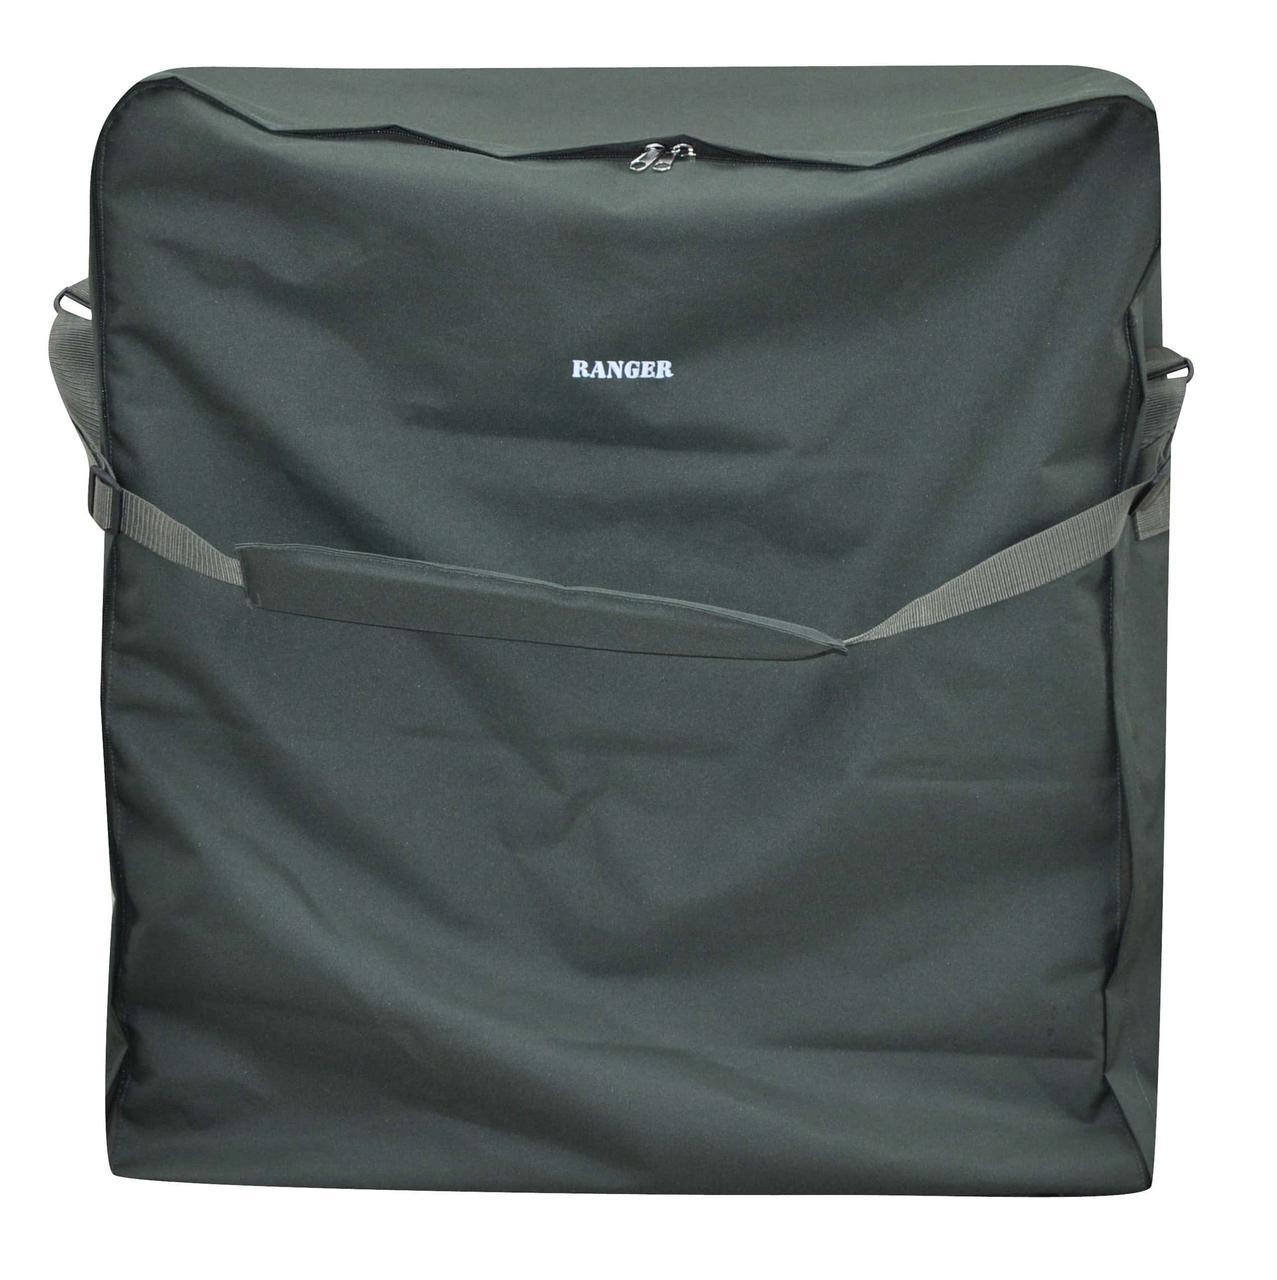 Чехол для карповой раскладушки Ranger  92х86х22 см зеленый